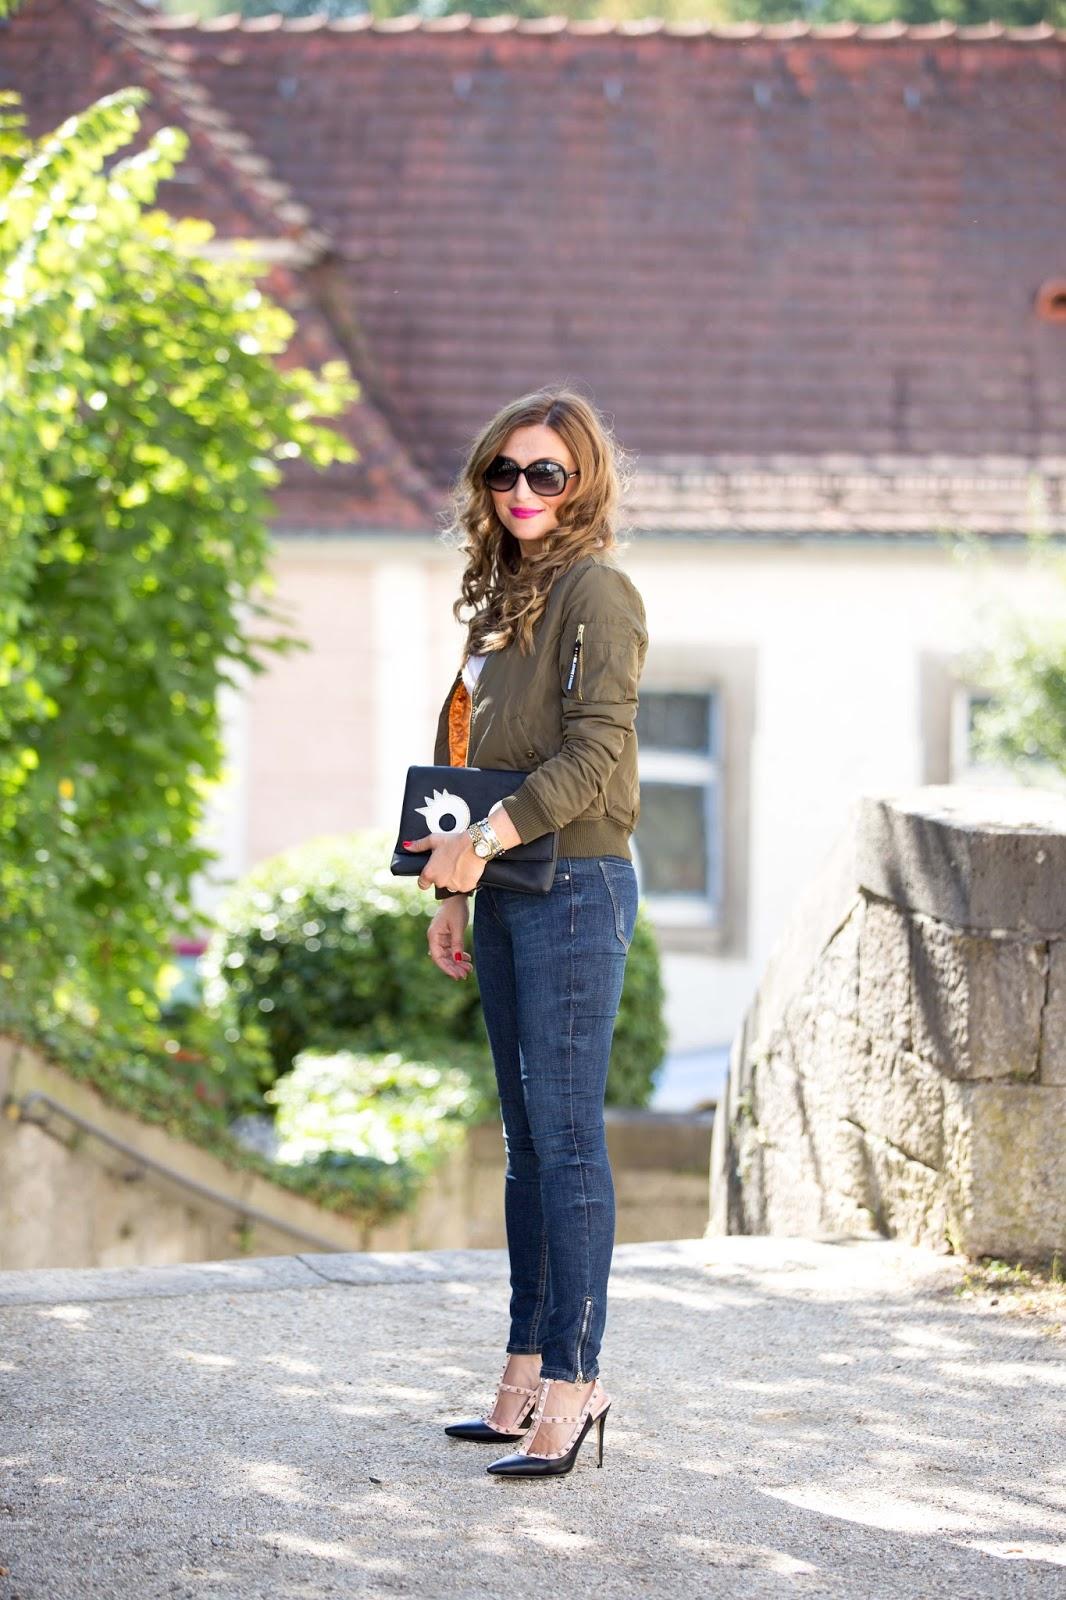 SheinsideFashionstylebyjohanna-fashionblog-frankfurt blogger-fashionblogger-bloggerdeutschland-lifestyleblog-modeblog-frankfurt-germanblogger-styleblog-bundfaltenhose-a-la-streetwear-chic